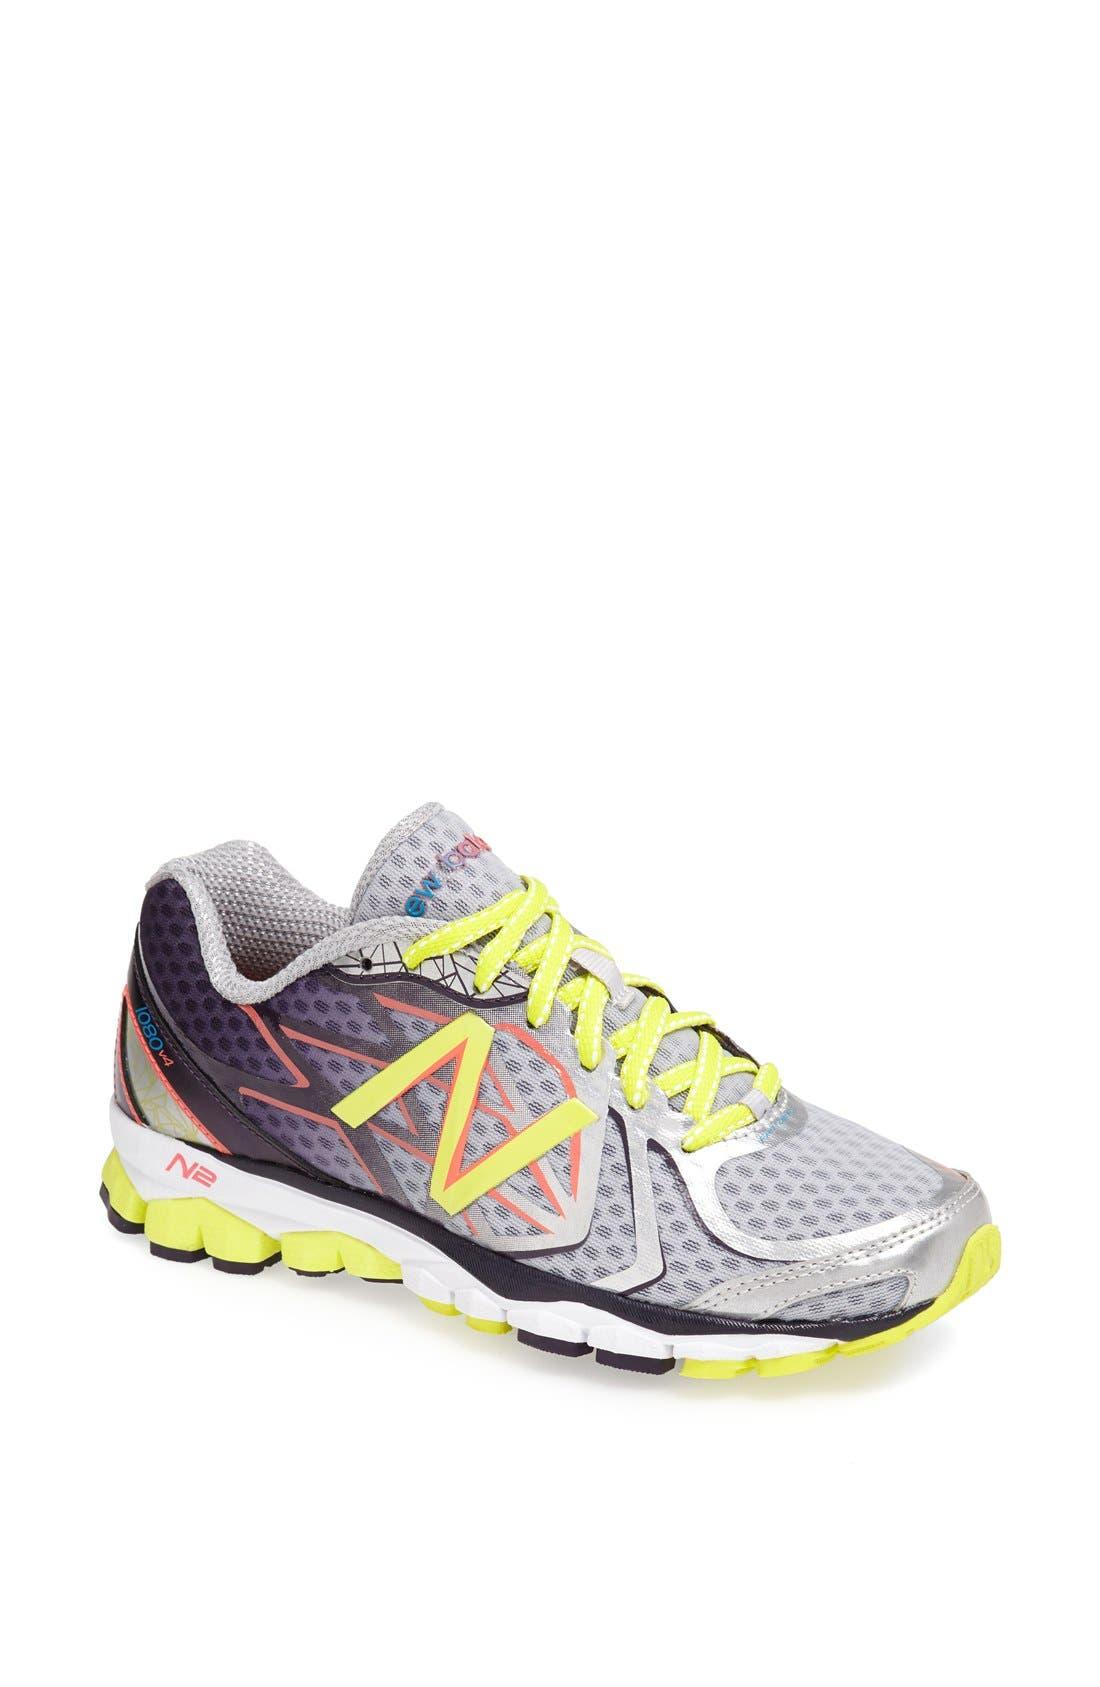 Alternate Image 1 Selected - New Balance '1080' Running Shoe (Women)